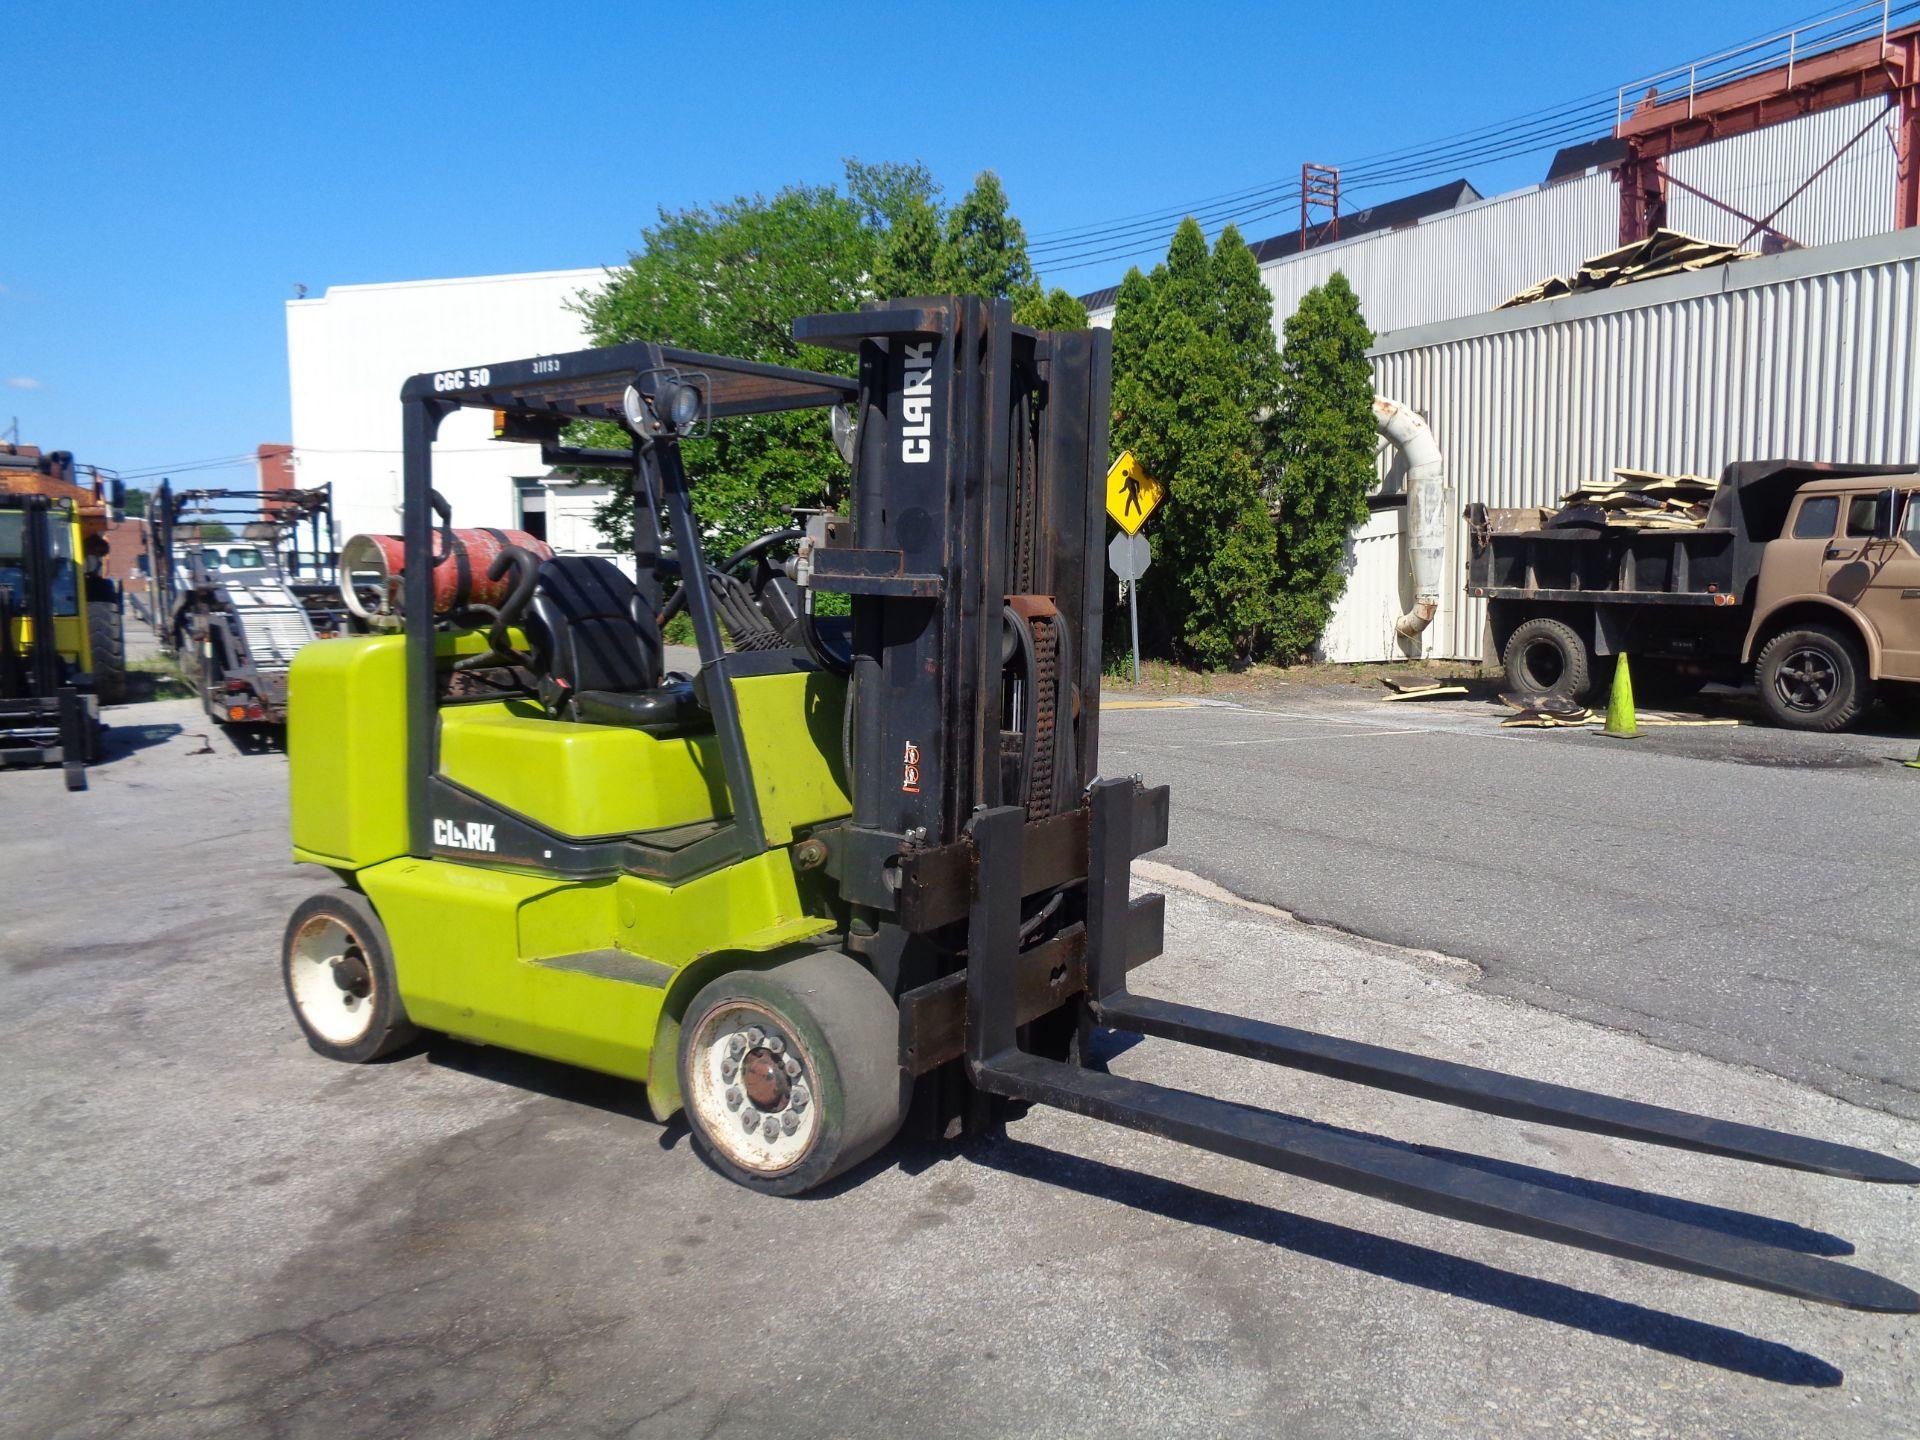 Lot 28 - 2014 Clark CGC500 10,000lb Forklift